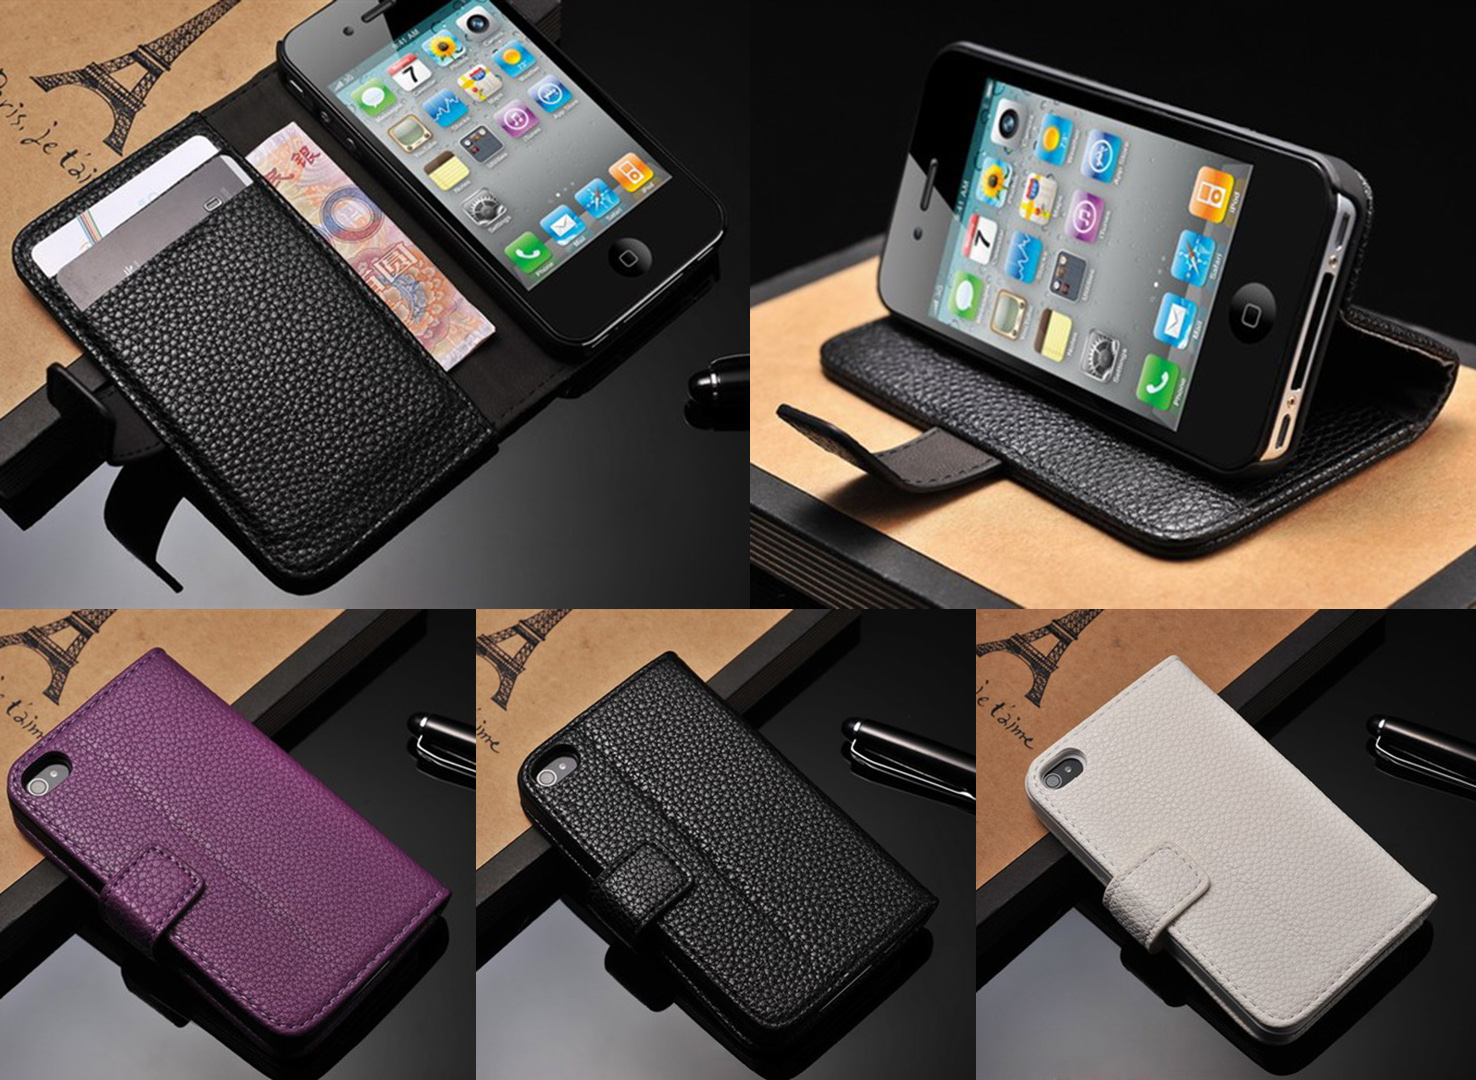 Ledertasche Iphone 4s Iphone 4 / 4s Design